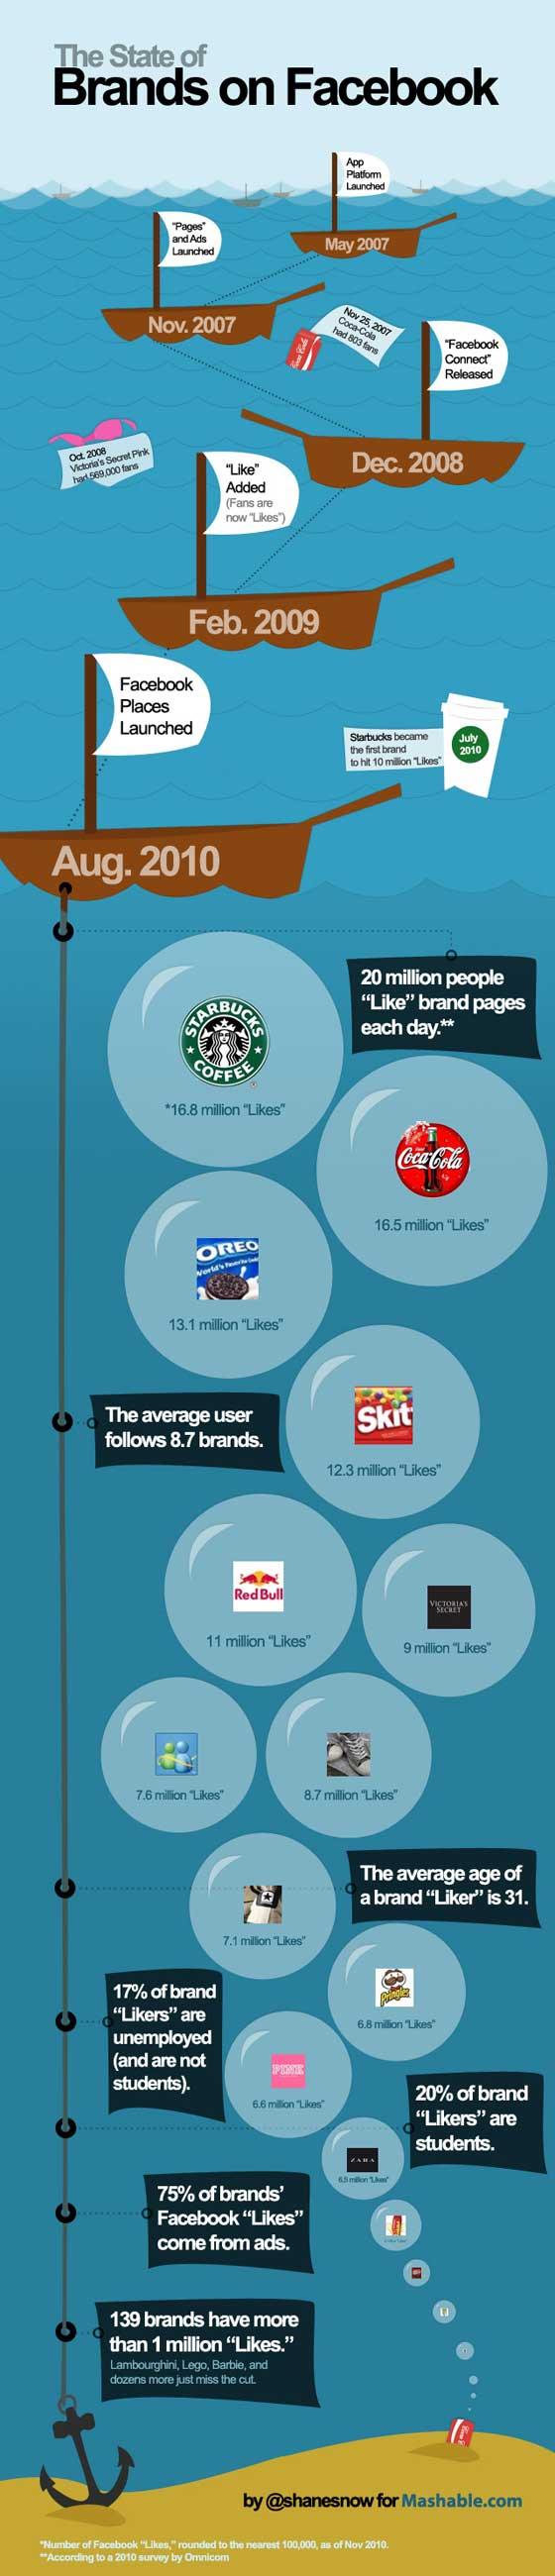 les-plus-grandes-marques-facebook